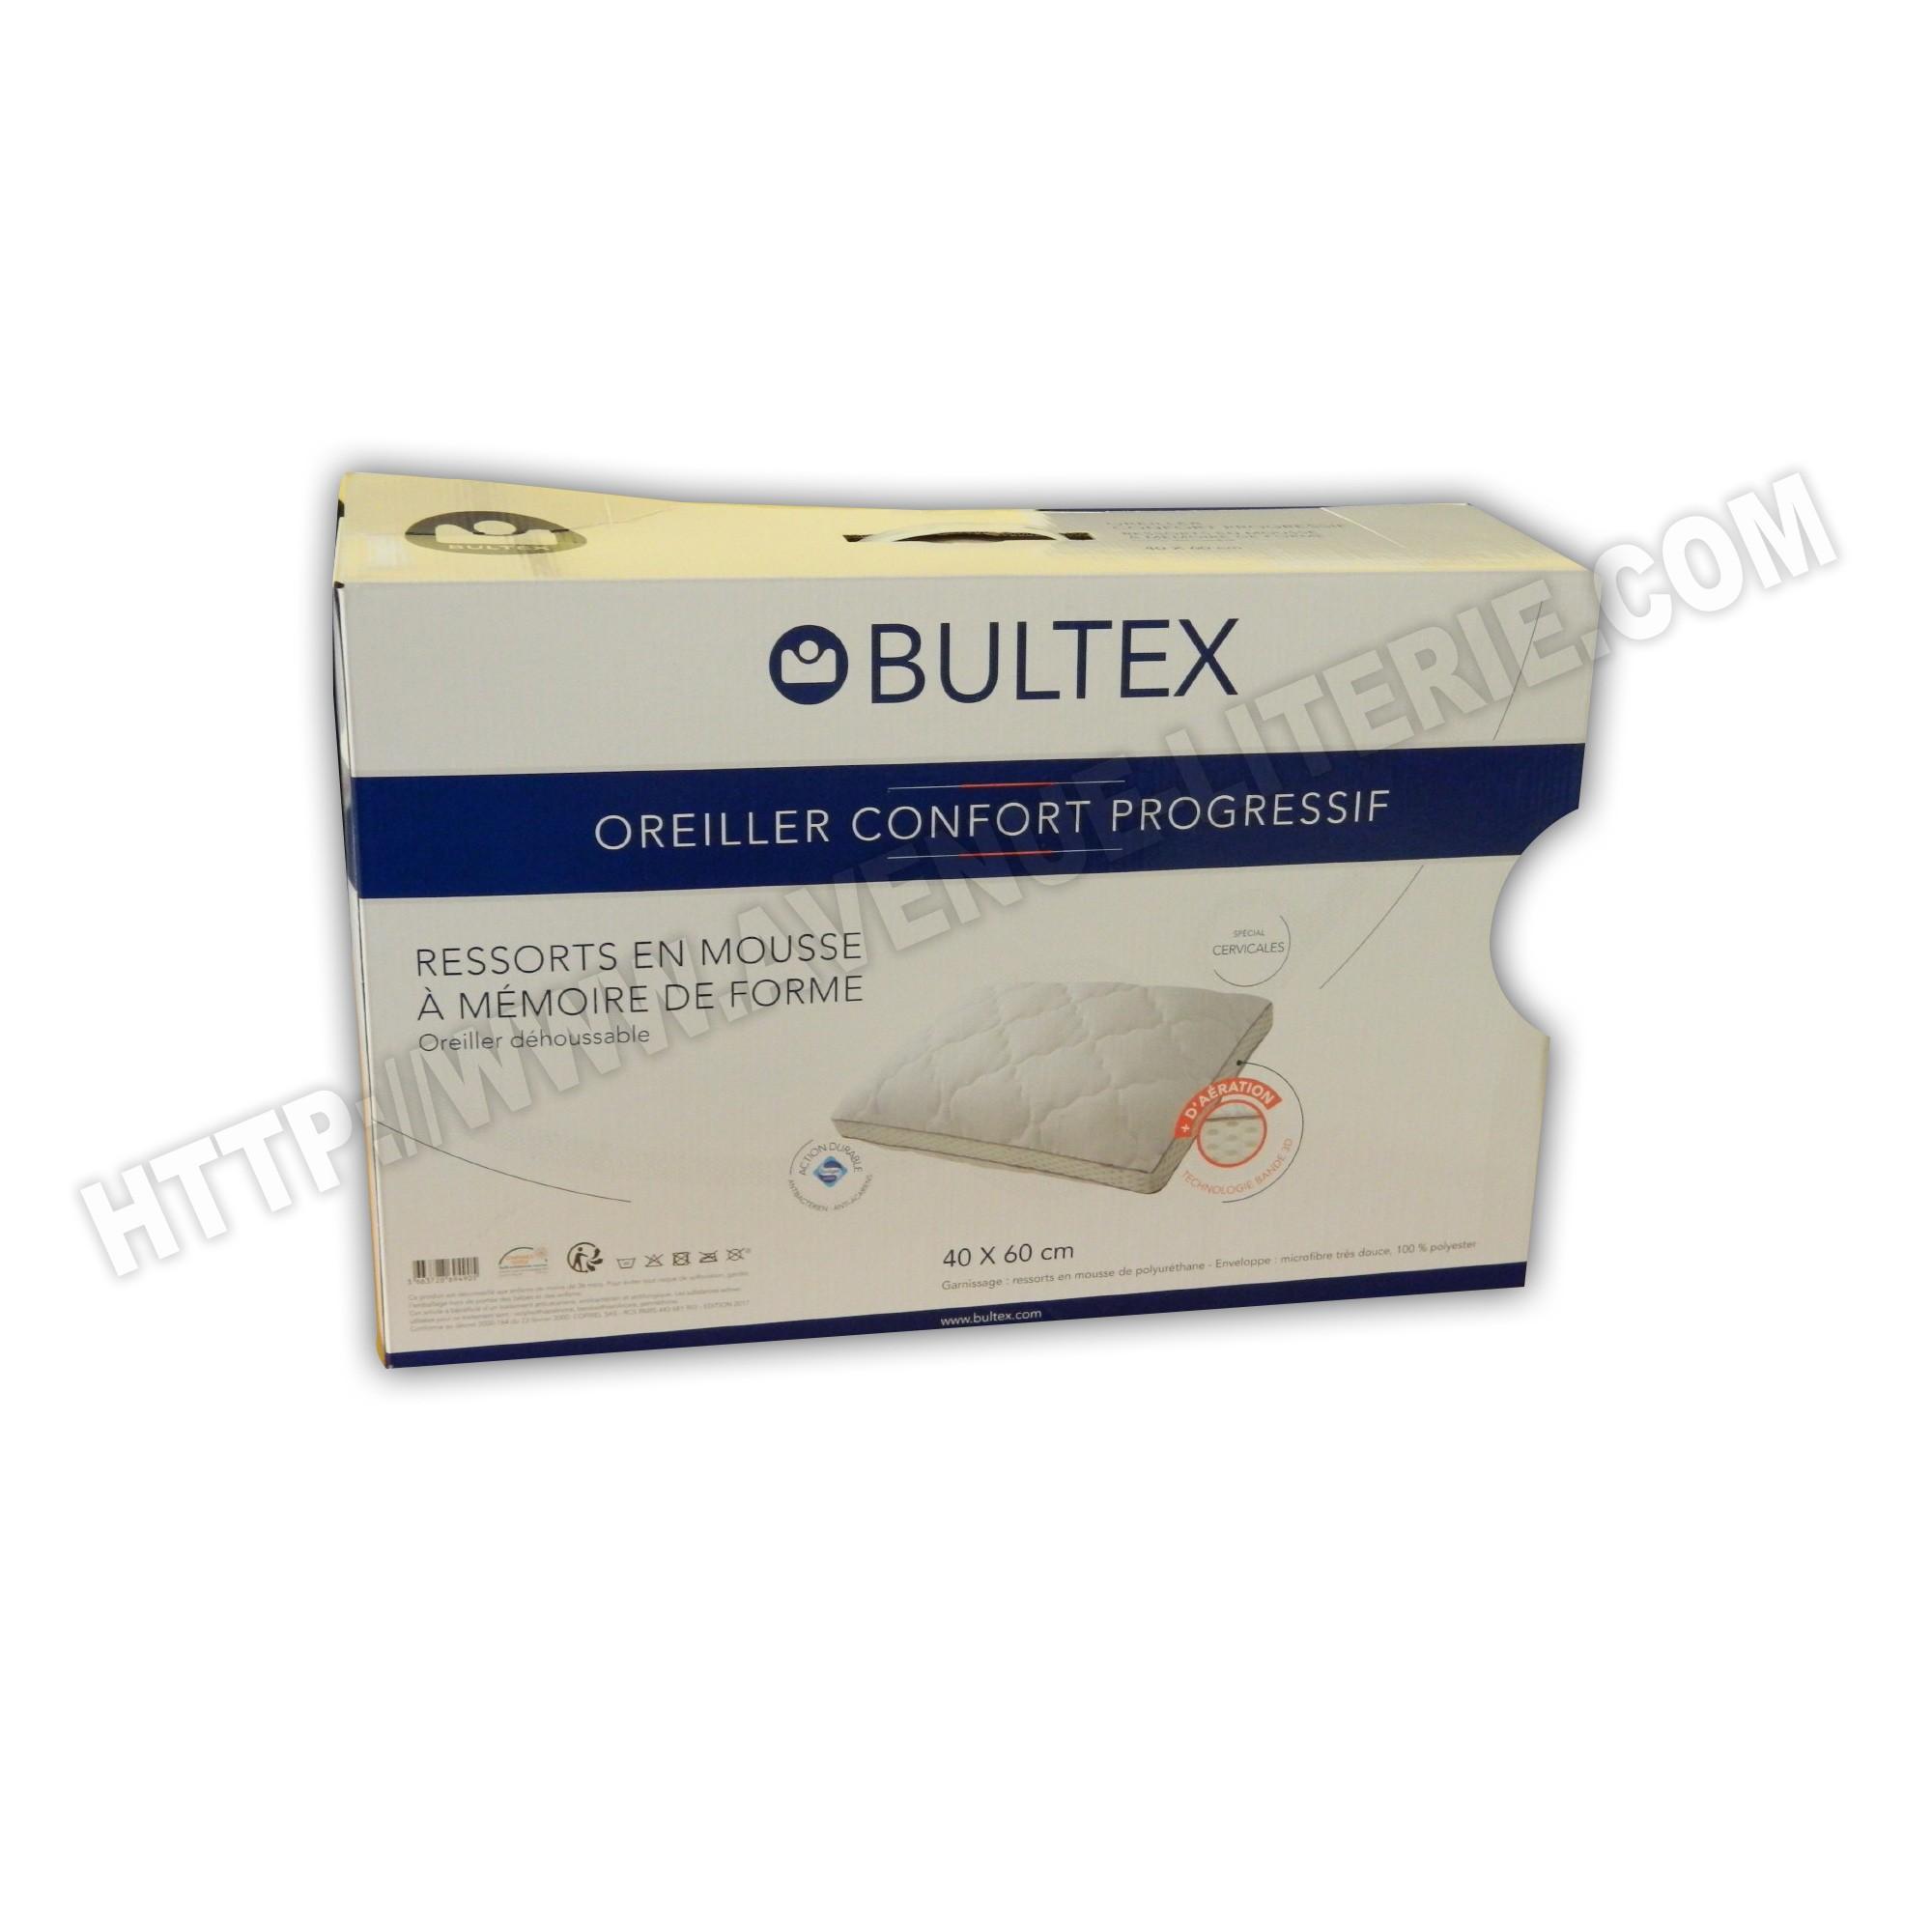 bultex ou latex elegant canape bz matelas dunlopillo banquette lit slyde cm khara latex sans. Black Bedroom Furniture Sets. Home Design Ideas